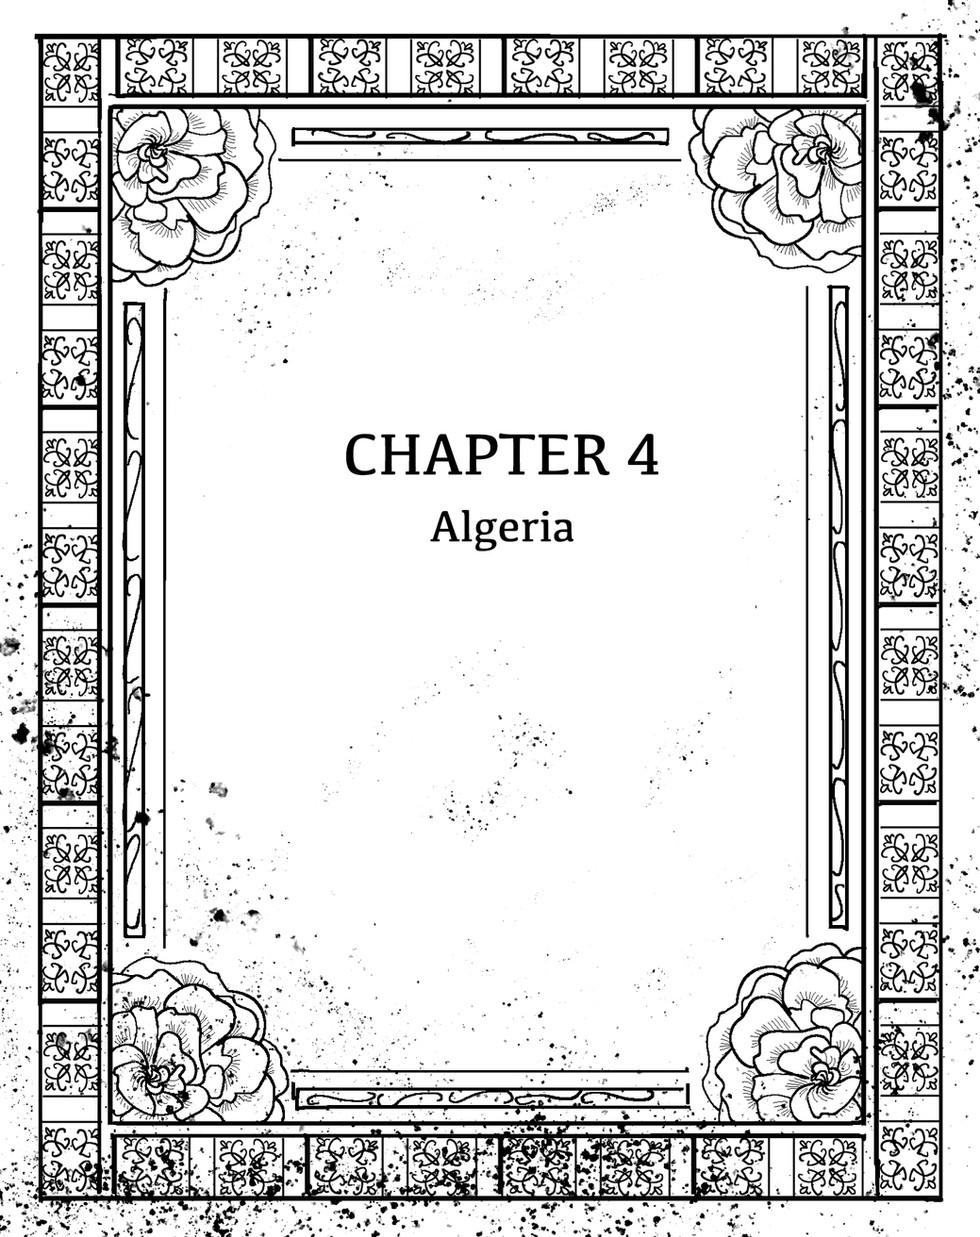 Amnesia_ChapterCard_4.jpg